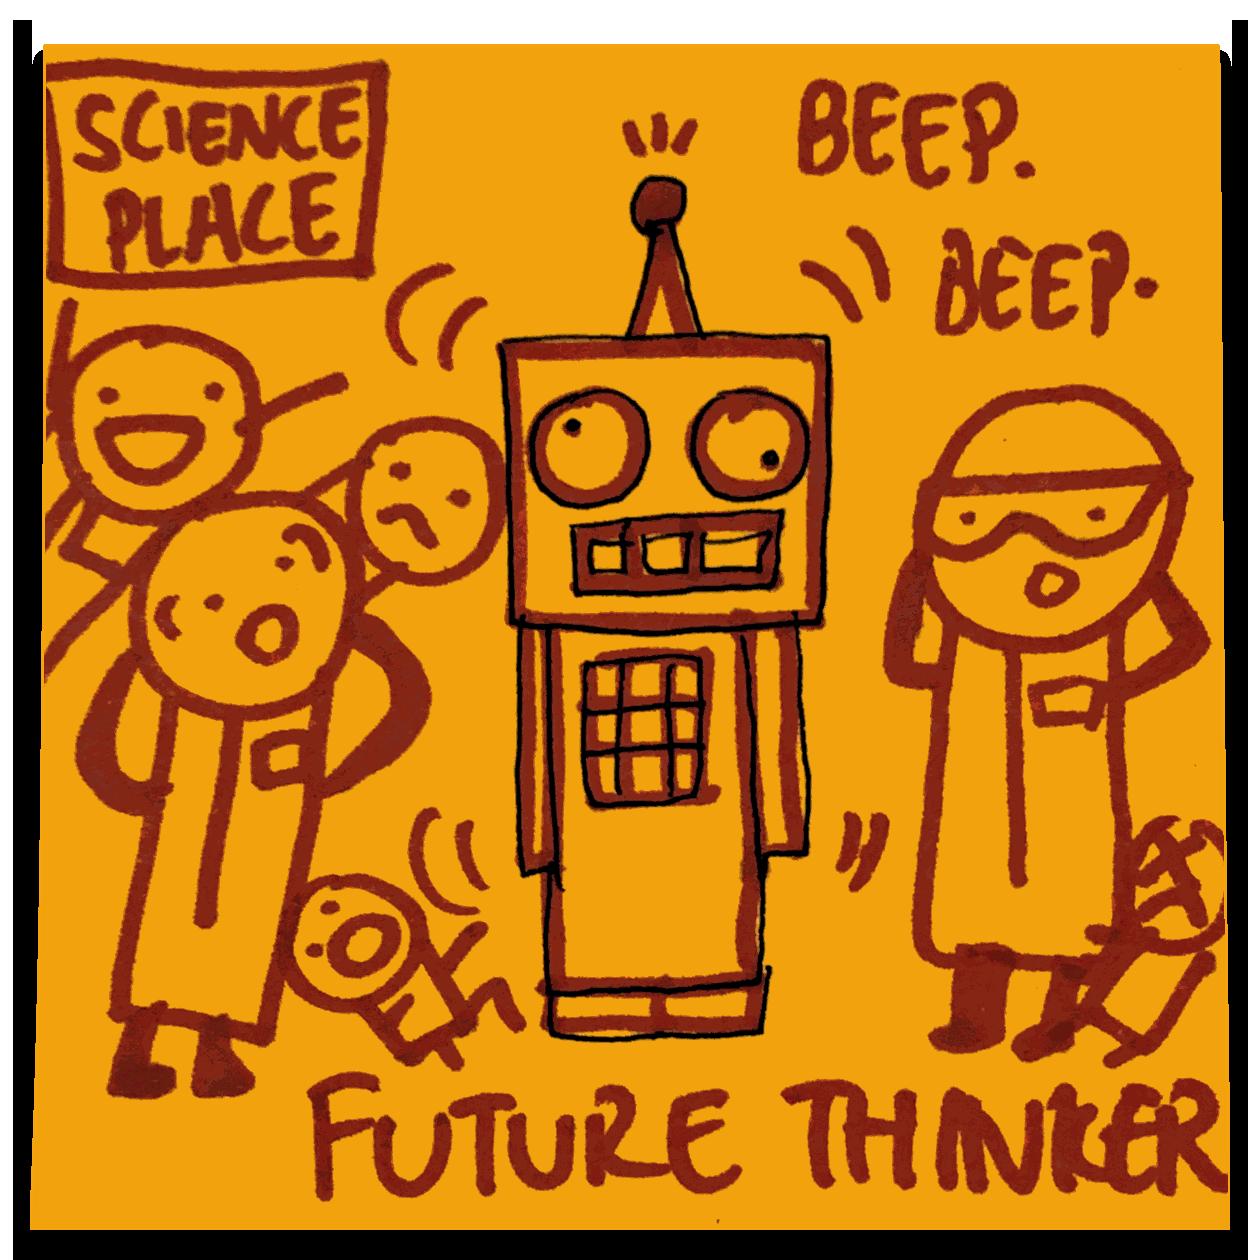 Future Thinker Strengths Explorer Singapore